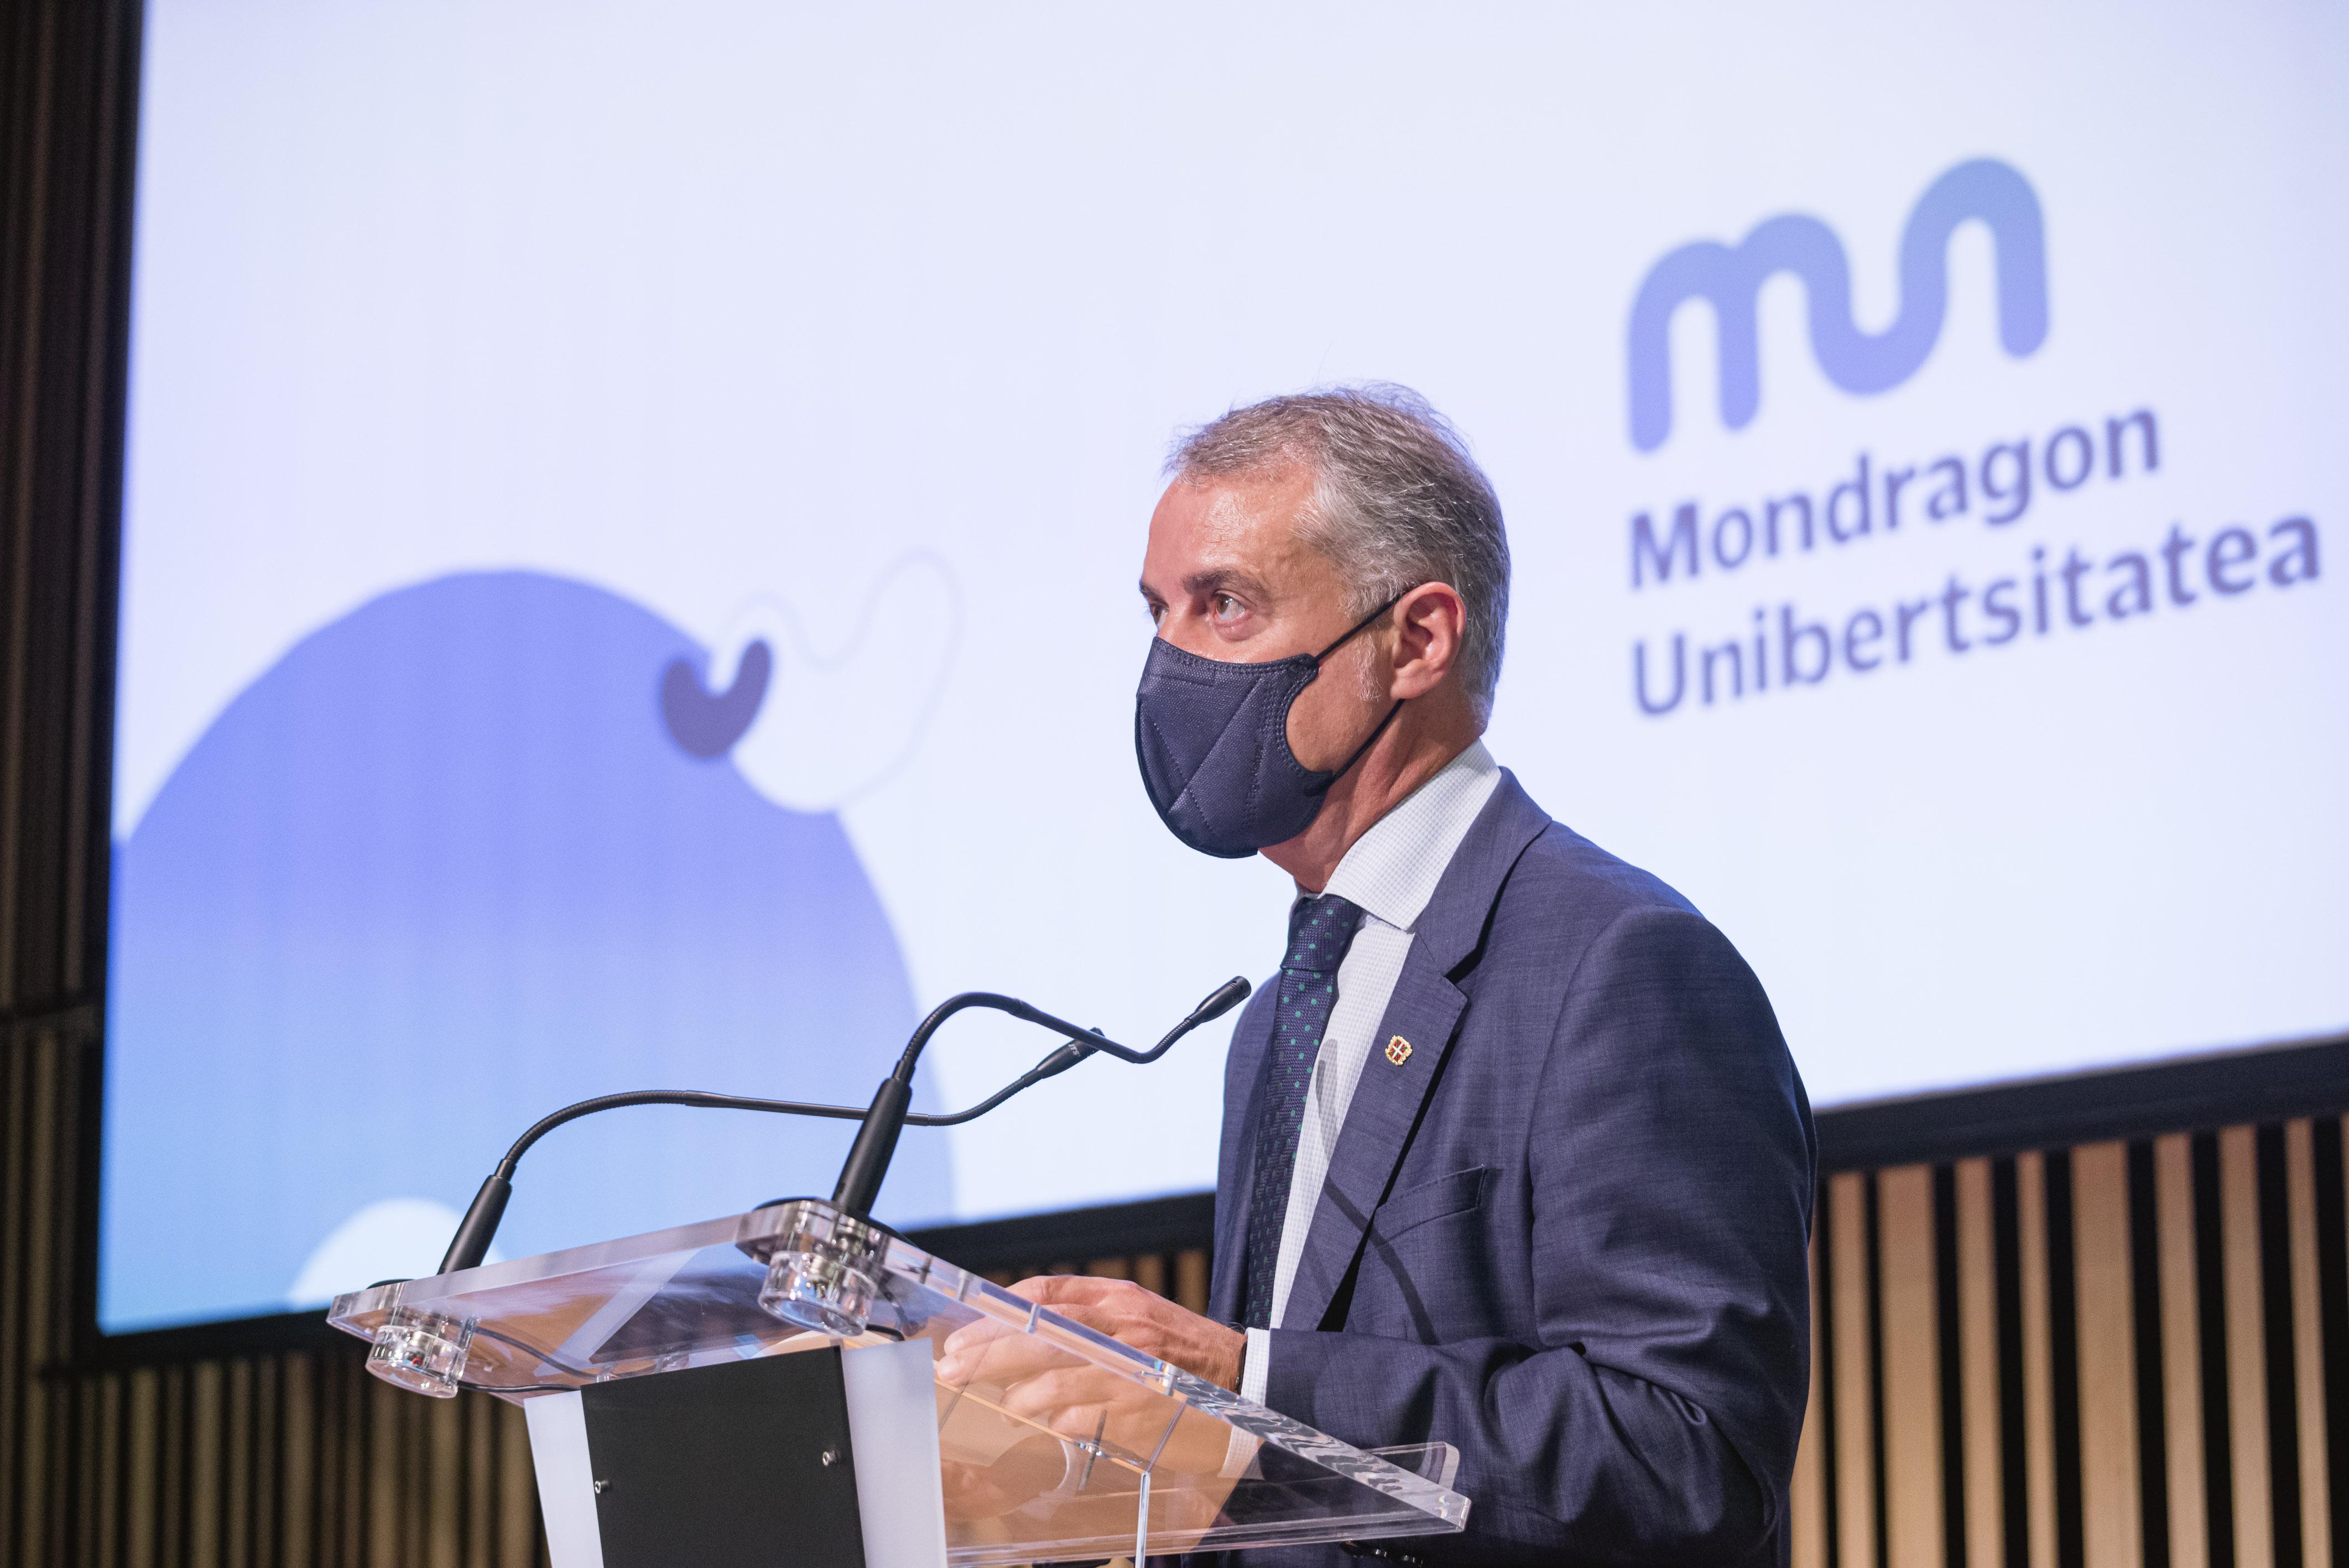 Mondragon_uni_donostia17-9-2021_usual-9837.jpg